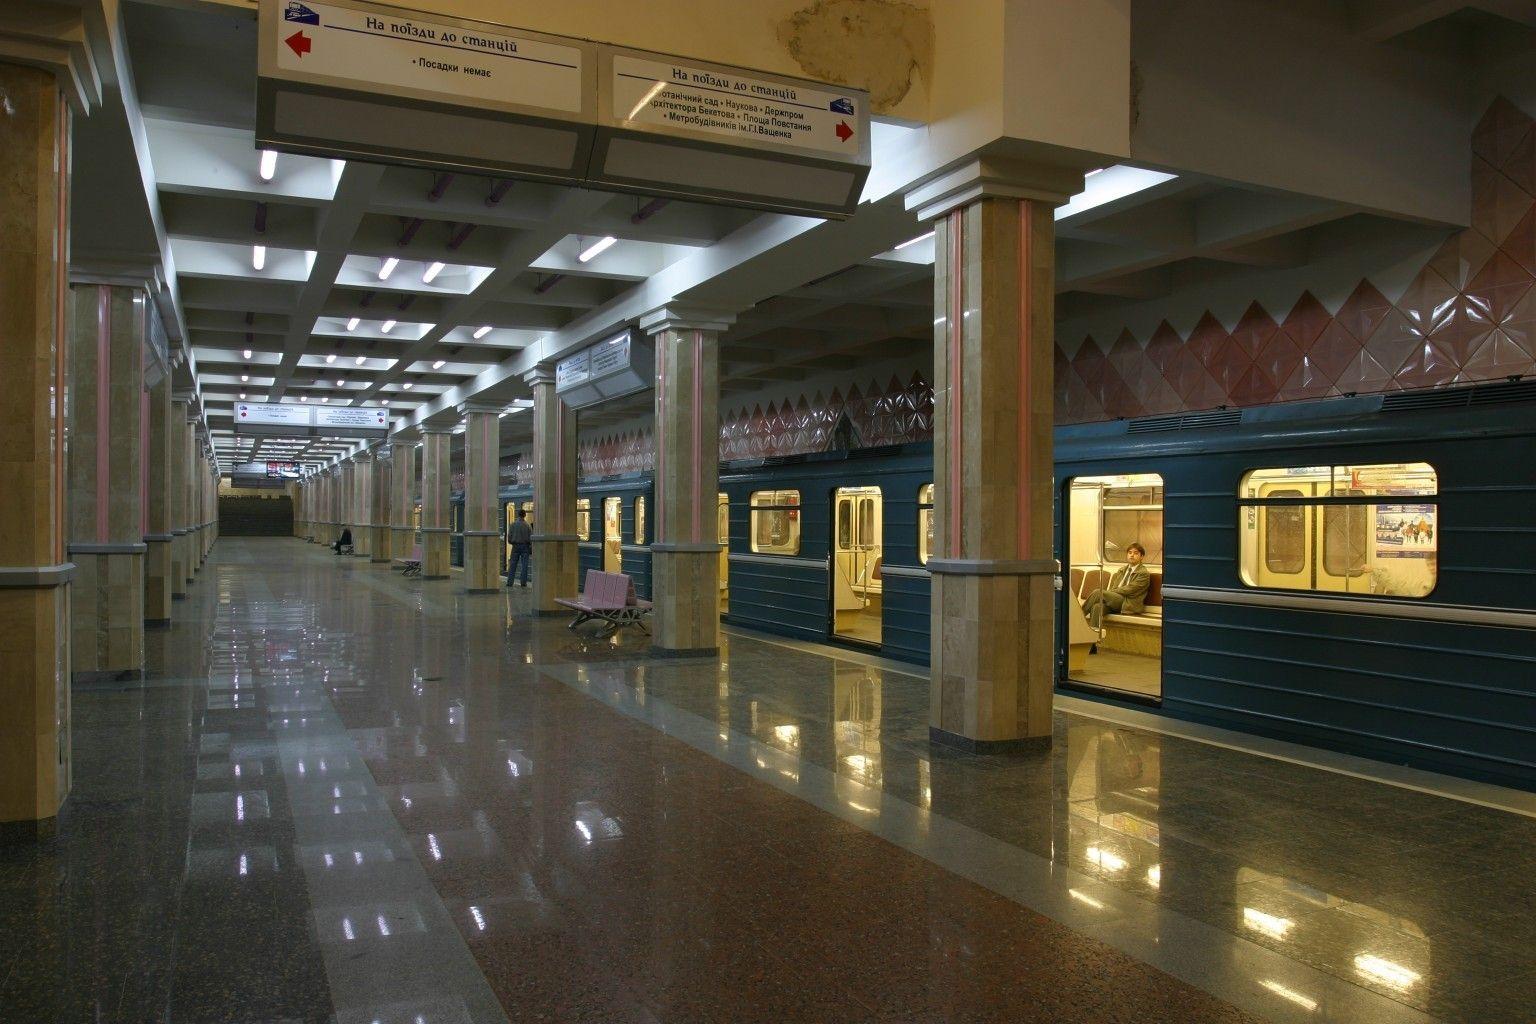 65-летний харьковчанин умер в метро / Фото metro.kharkov.ua